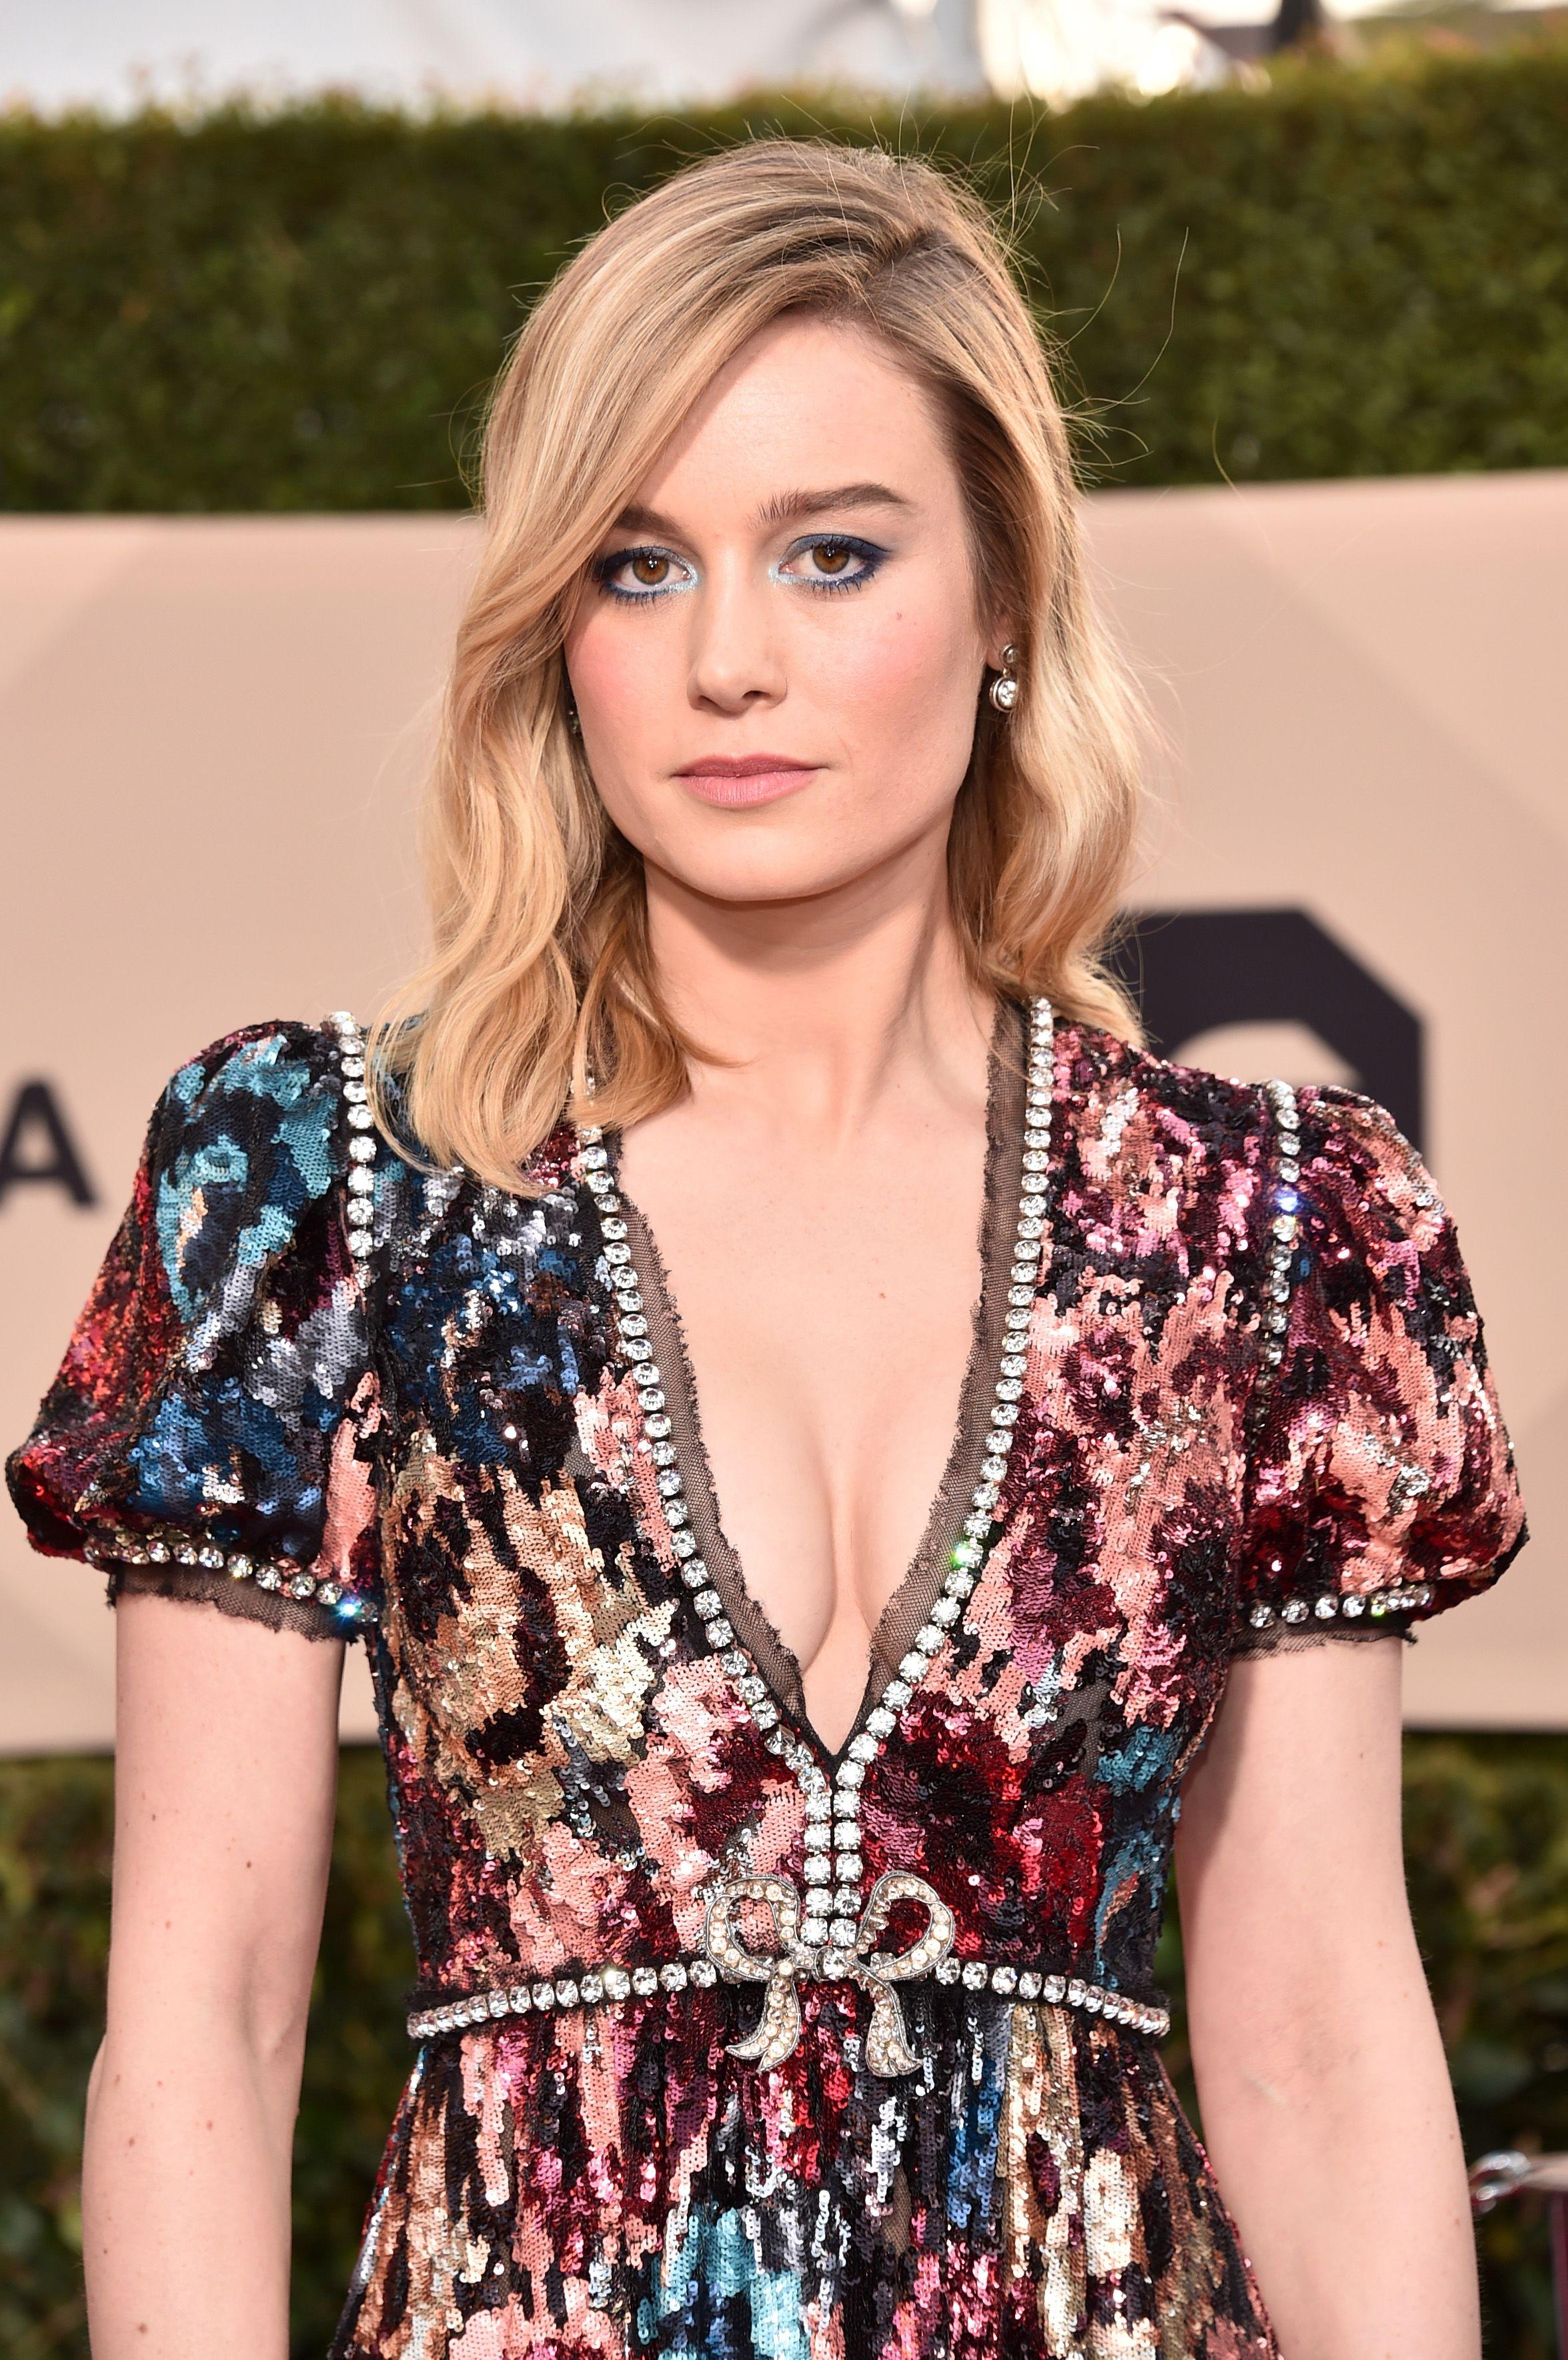 Brie Larson The 24th Annual Screen Actors Guild Awards